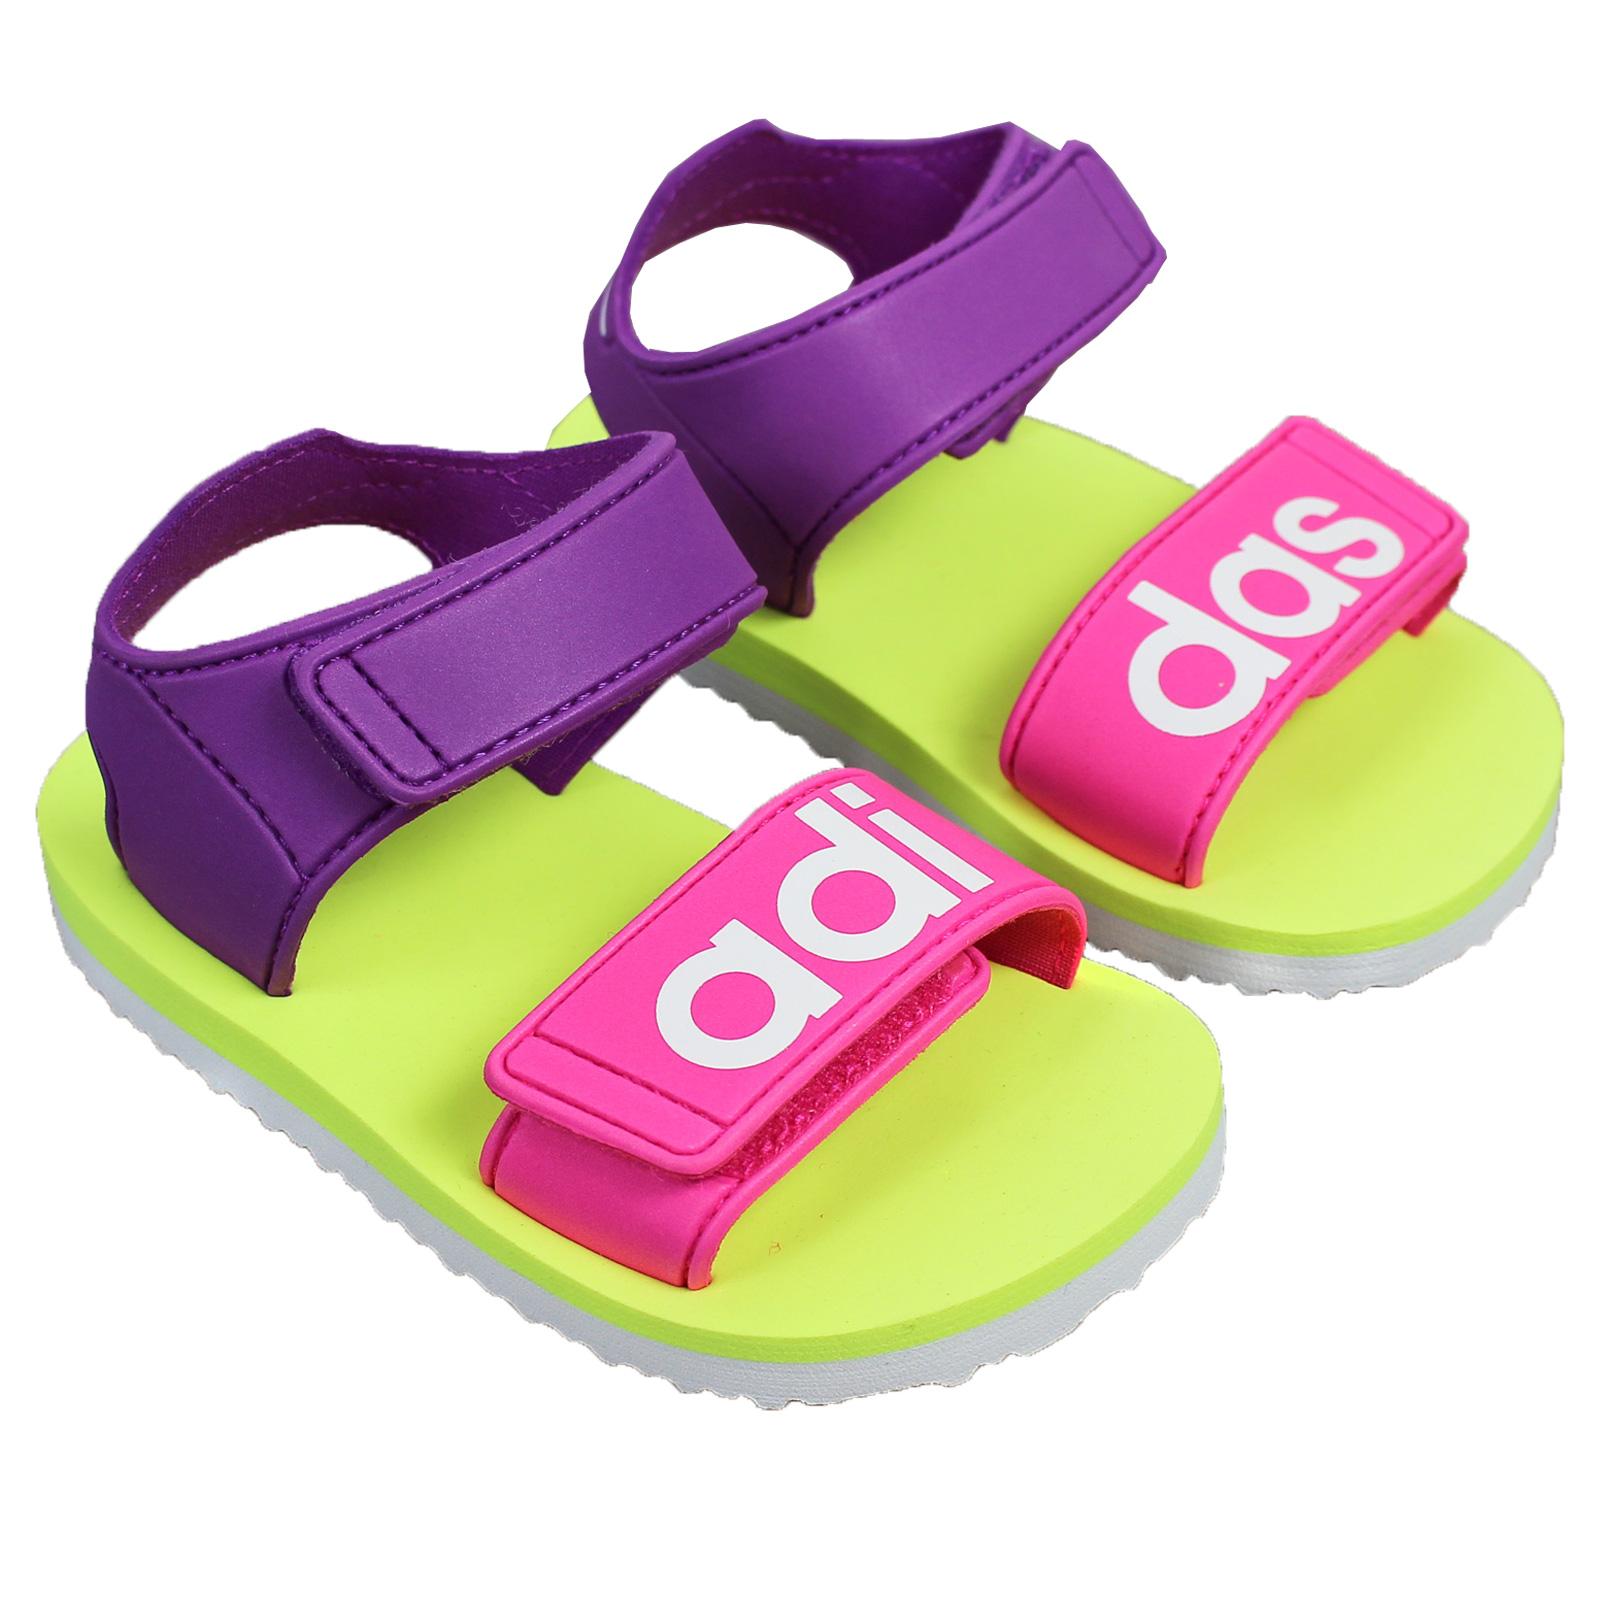 buy online 68fef 15519 adidas Beach Sandale Kinder Badeschuhe Sommerschuhe Strand Schwimmbad Pink  Lila